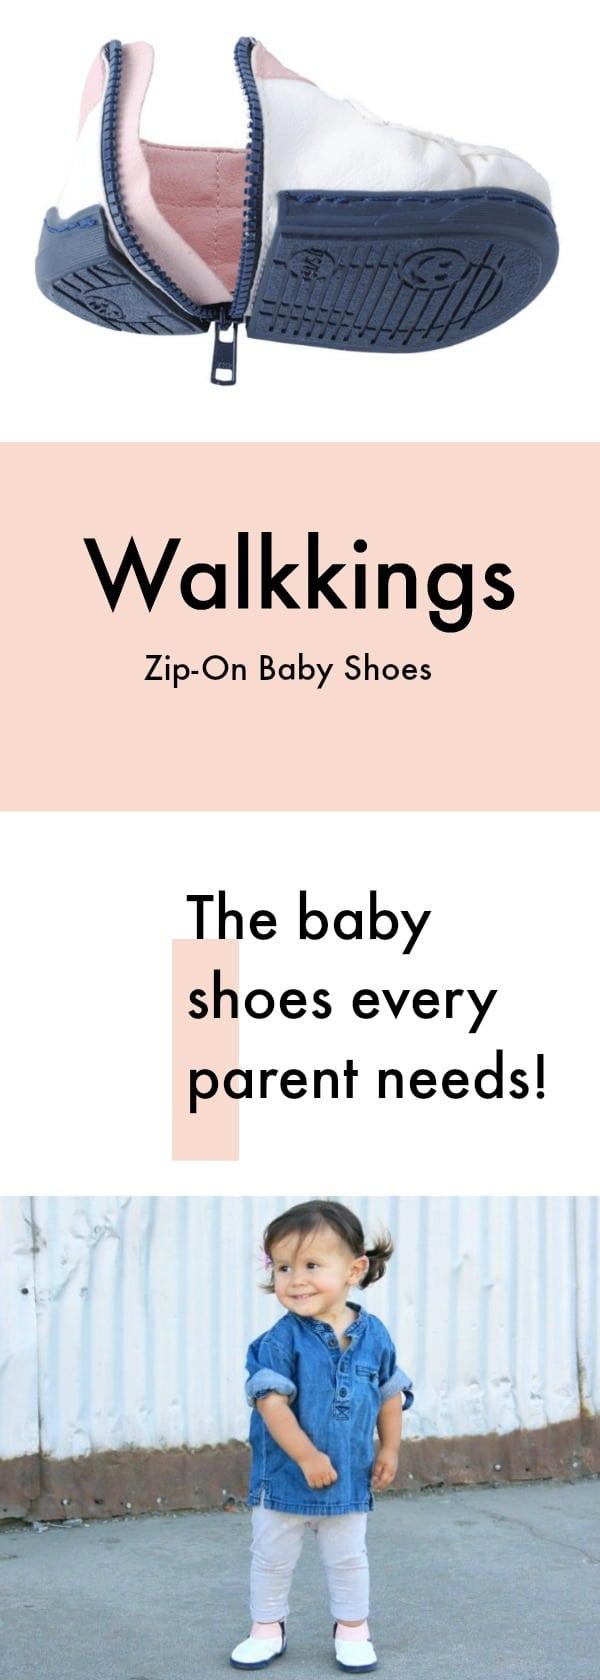 Walkkings Zip-On Baby Shoes